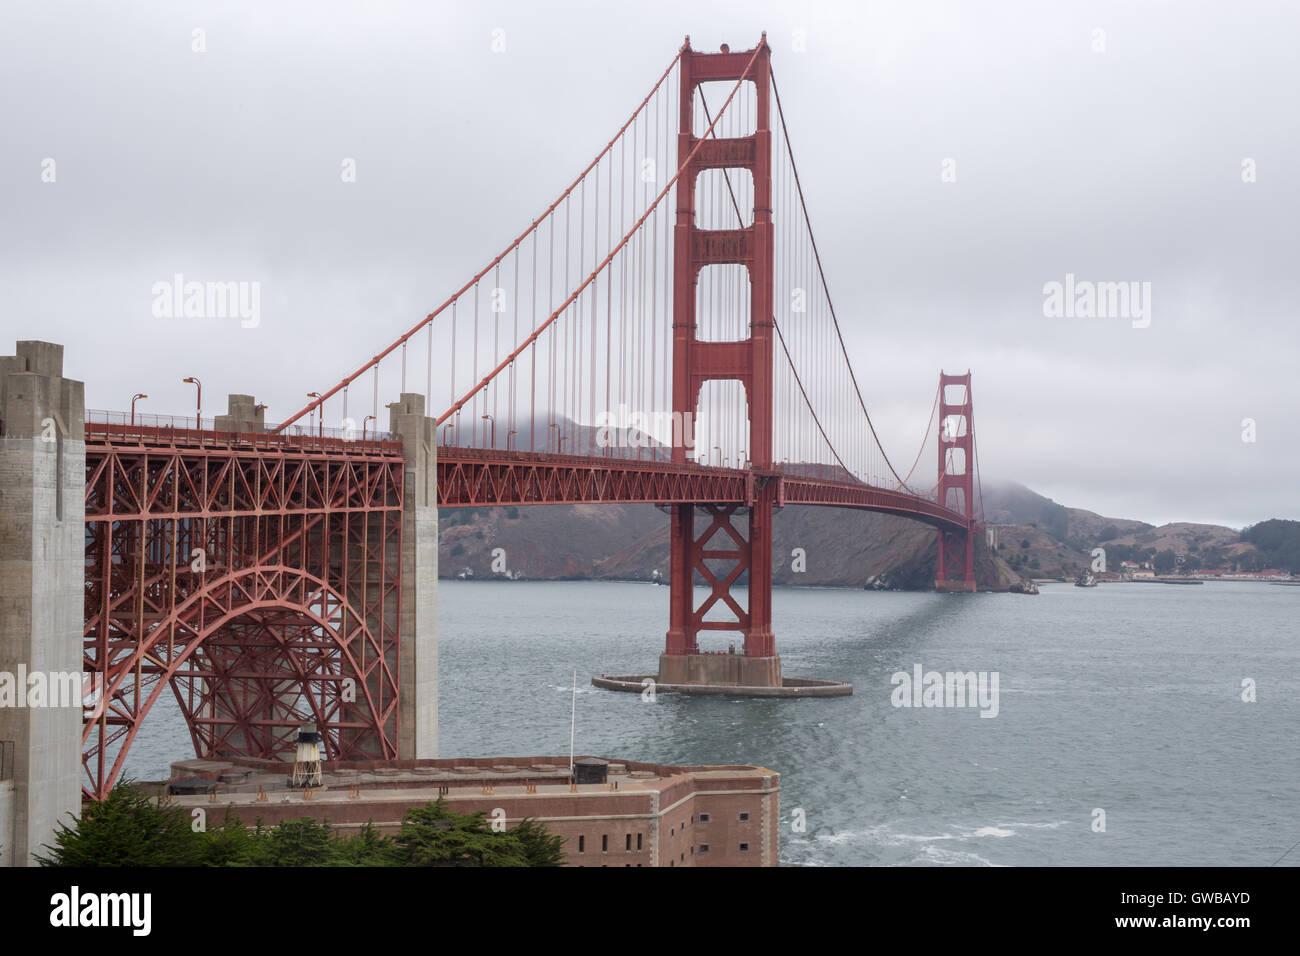 Golden Gate Bridge from the Welcome Center, San Francisco, California, USA - Stock Image